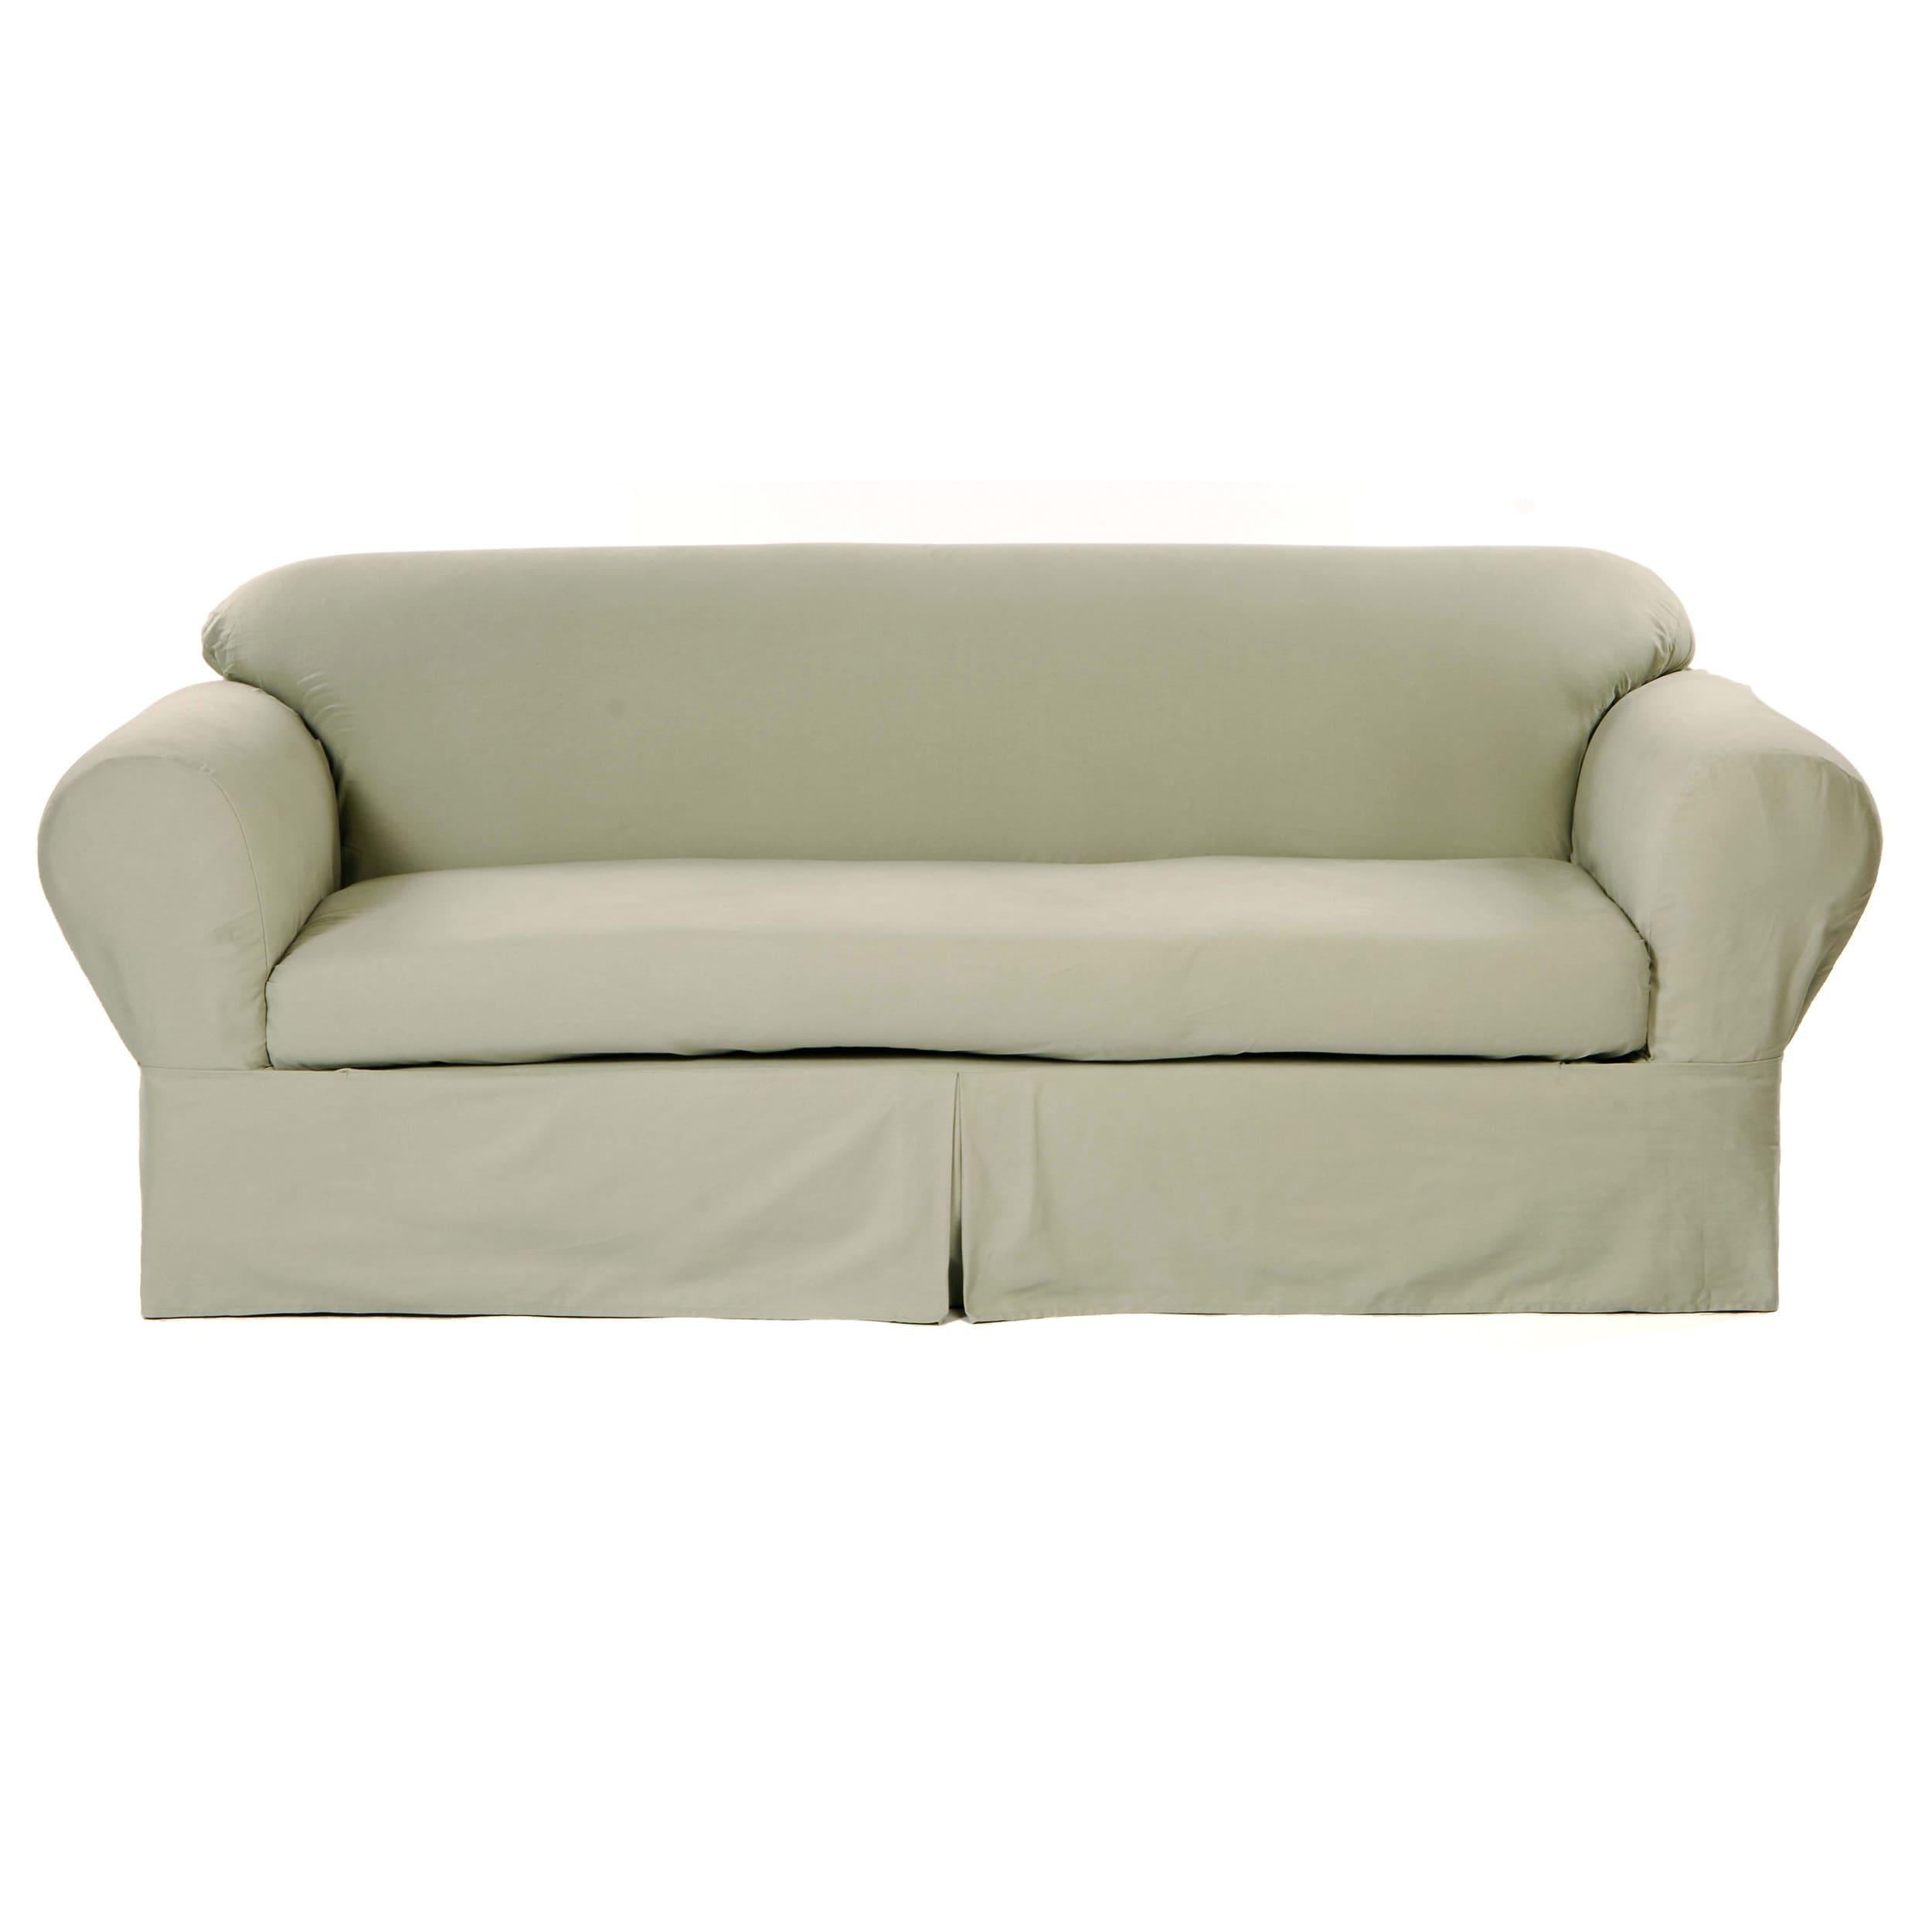 Twill Sofa Whole Interiors 2 Piece Twill Sofa Sectional